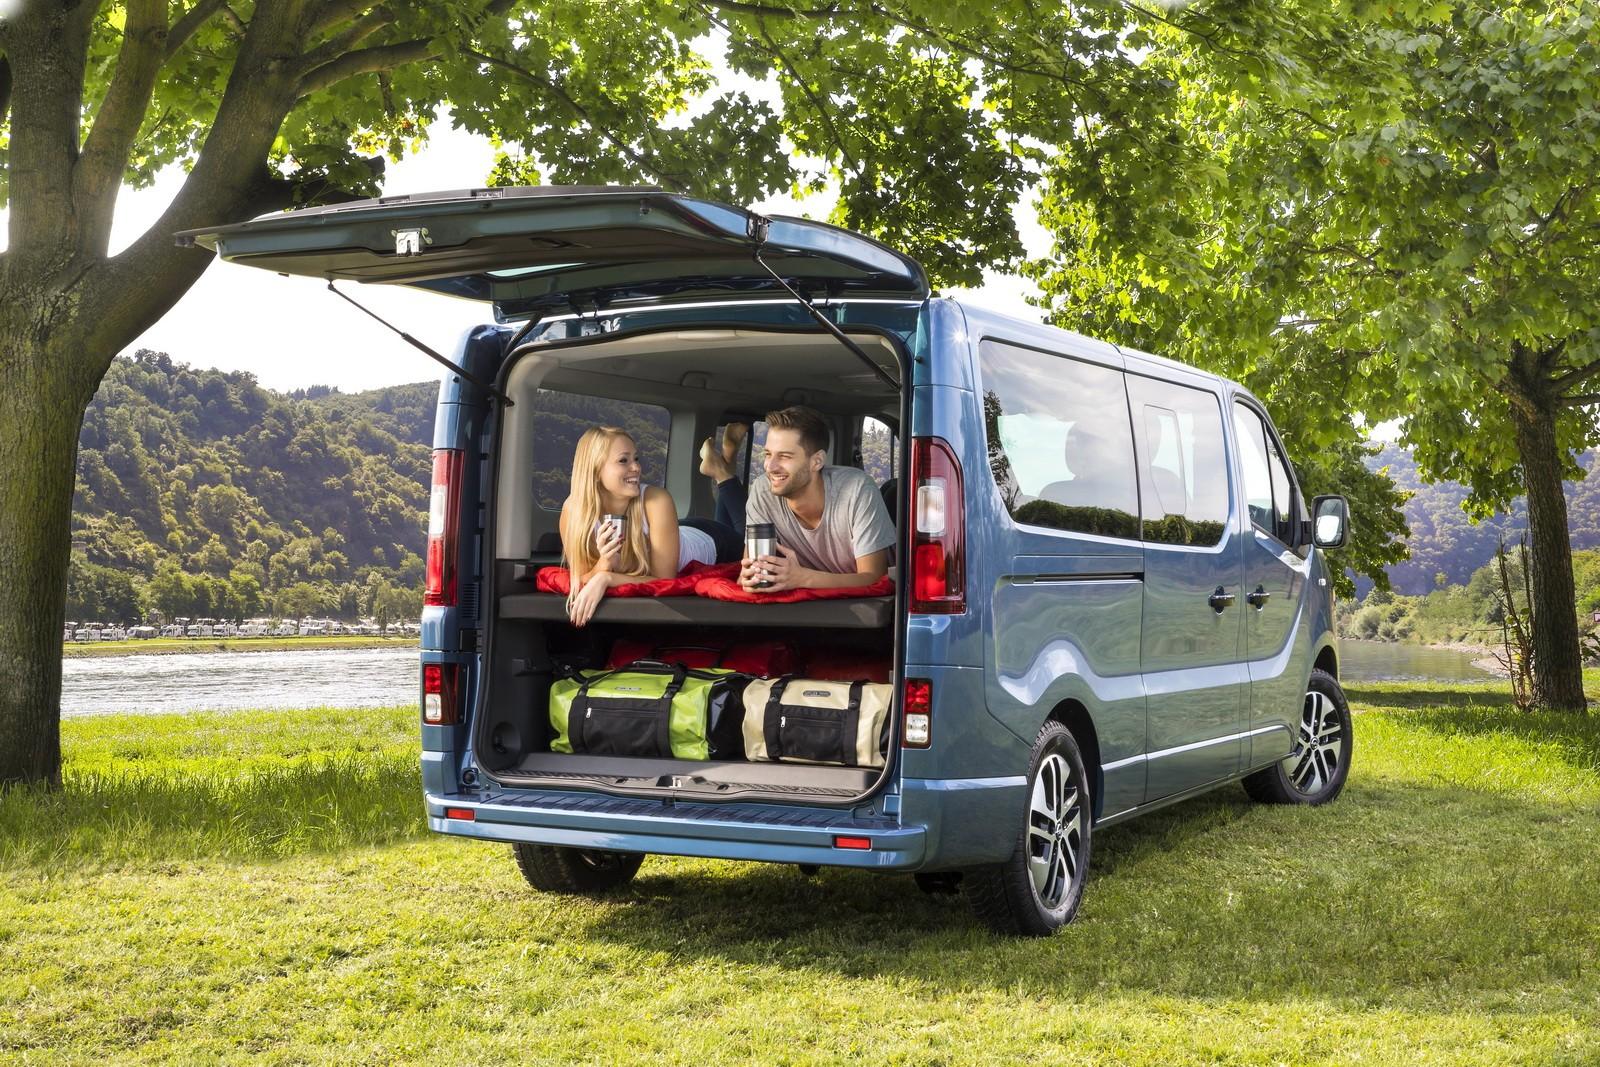 opel vivaro life makes camper vans look cool in frankfurt. Black Bedroom Furniture Sets. Home Design Ideas